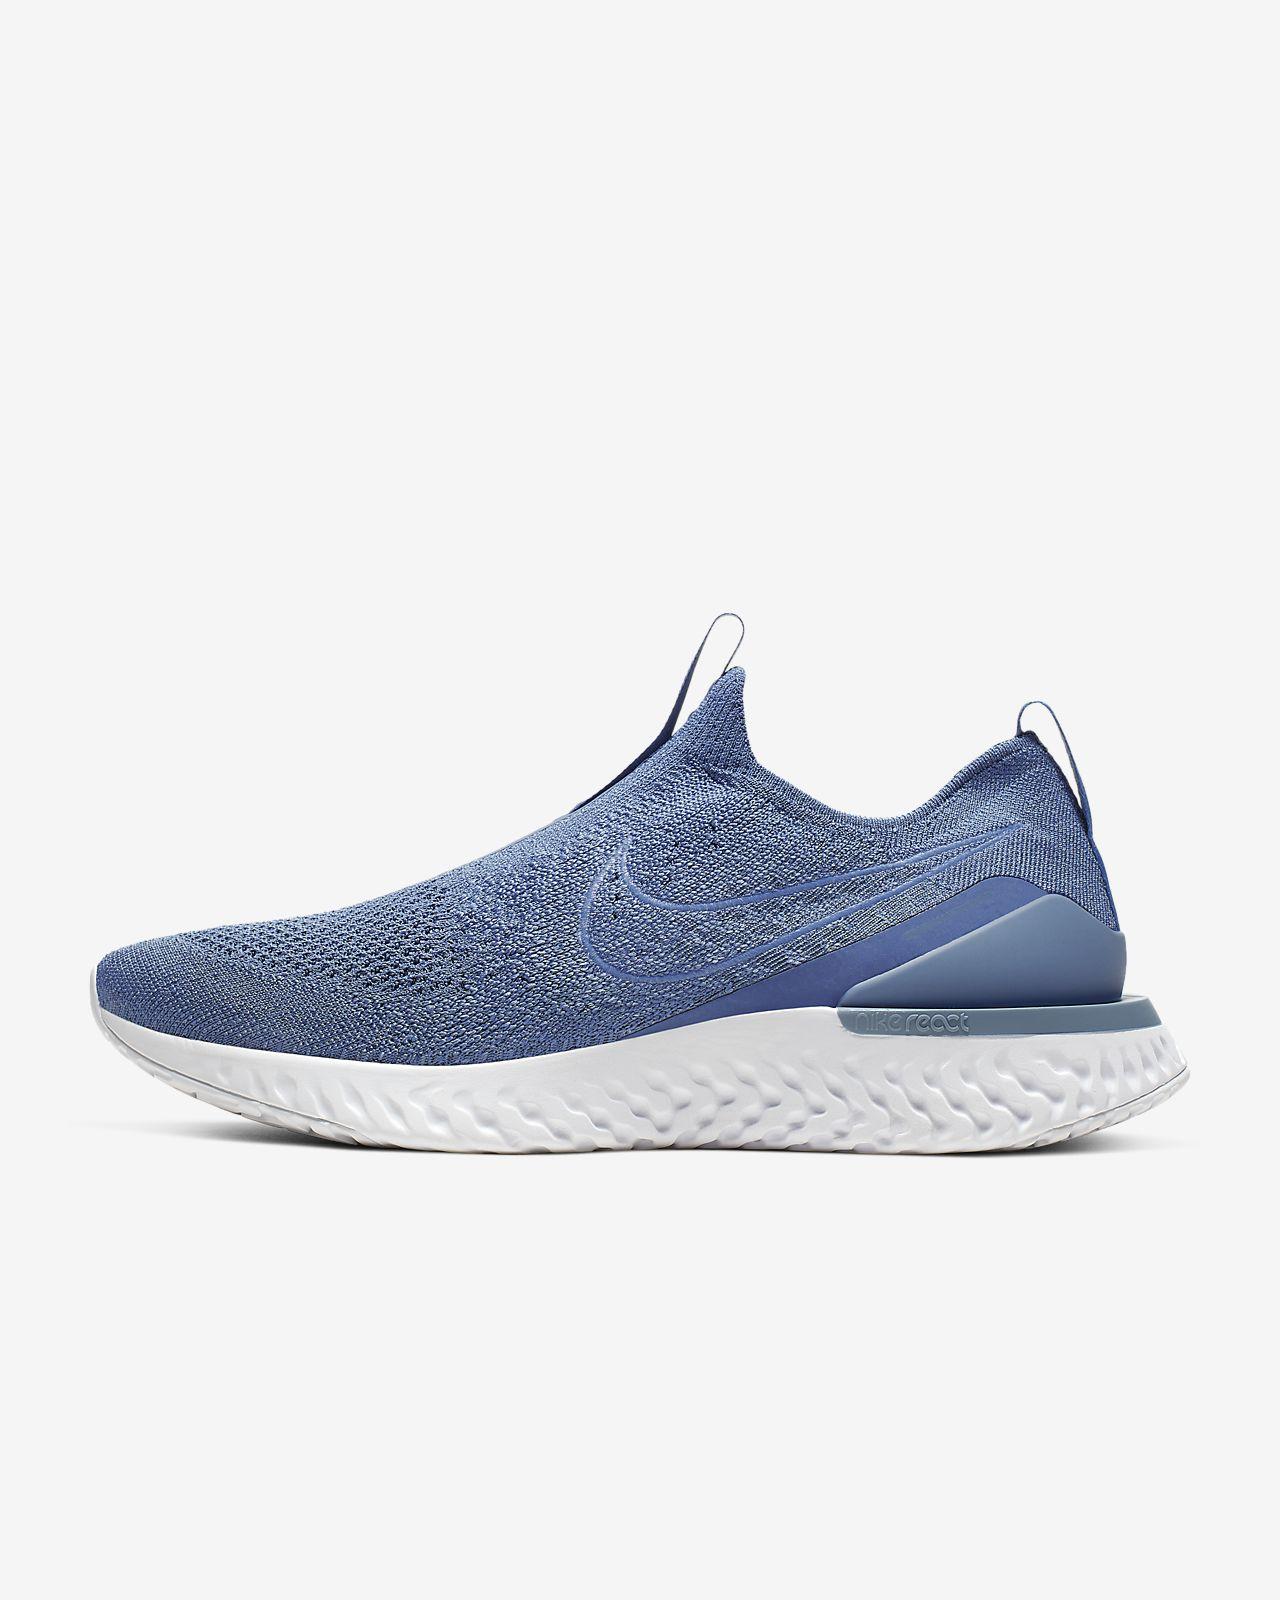 new product 69096 54721 Nike Epic Phantom React Flyknit Men's Running Shoe